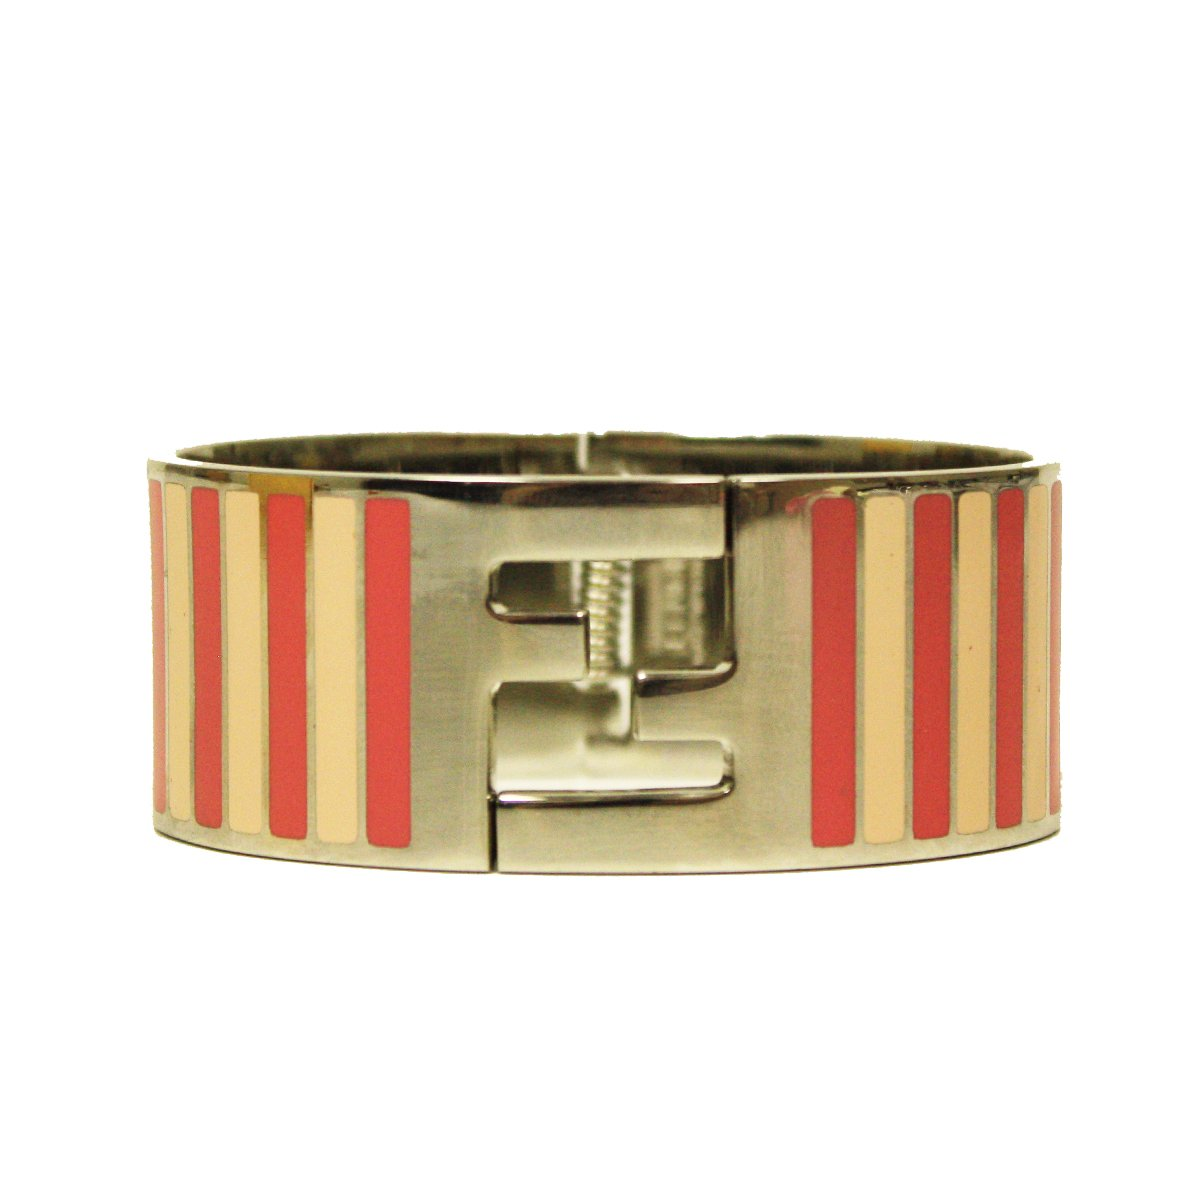 Fendi Silver Enamel Cuff with Pink Pequin Stripes Clic Clac Bracelet 8AG137